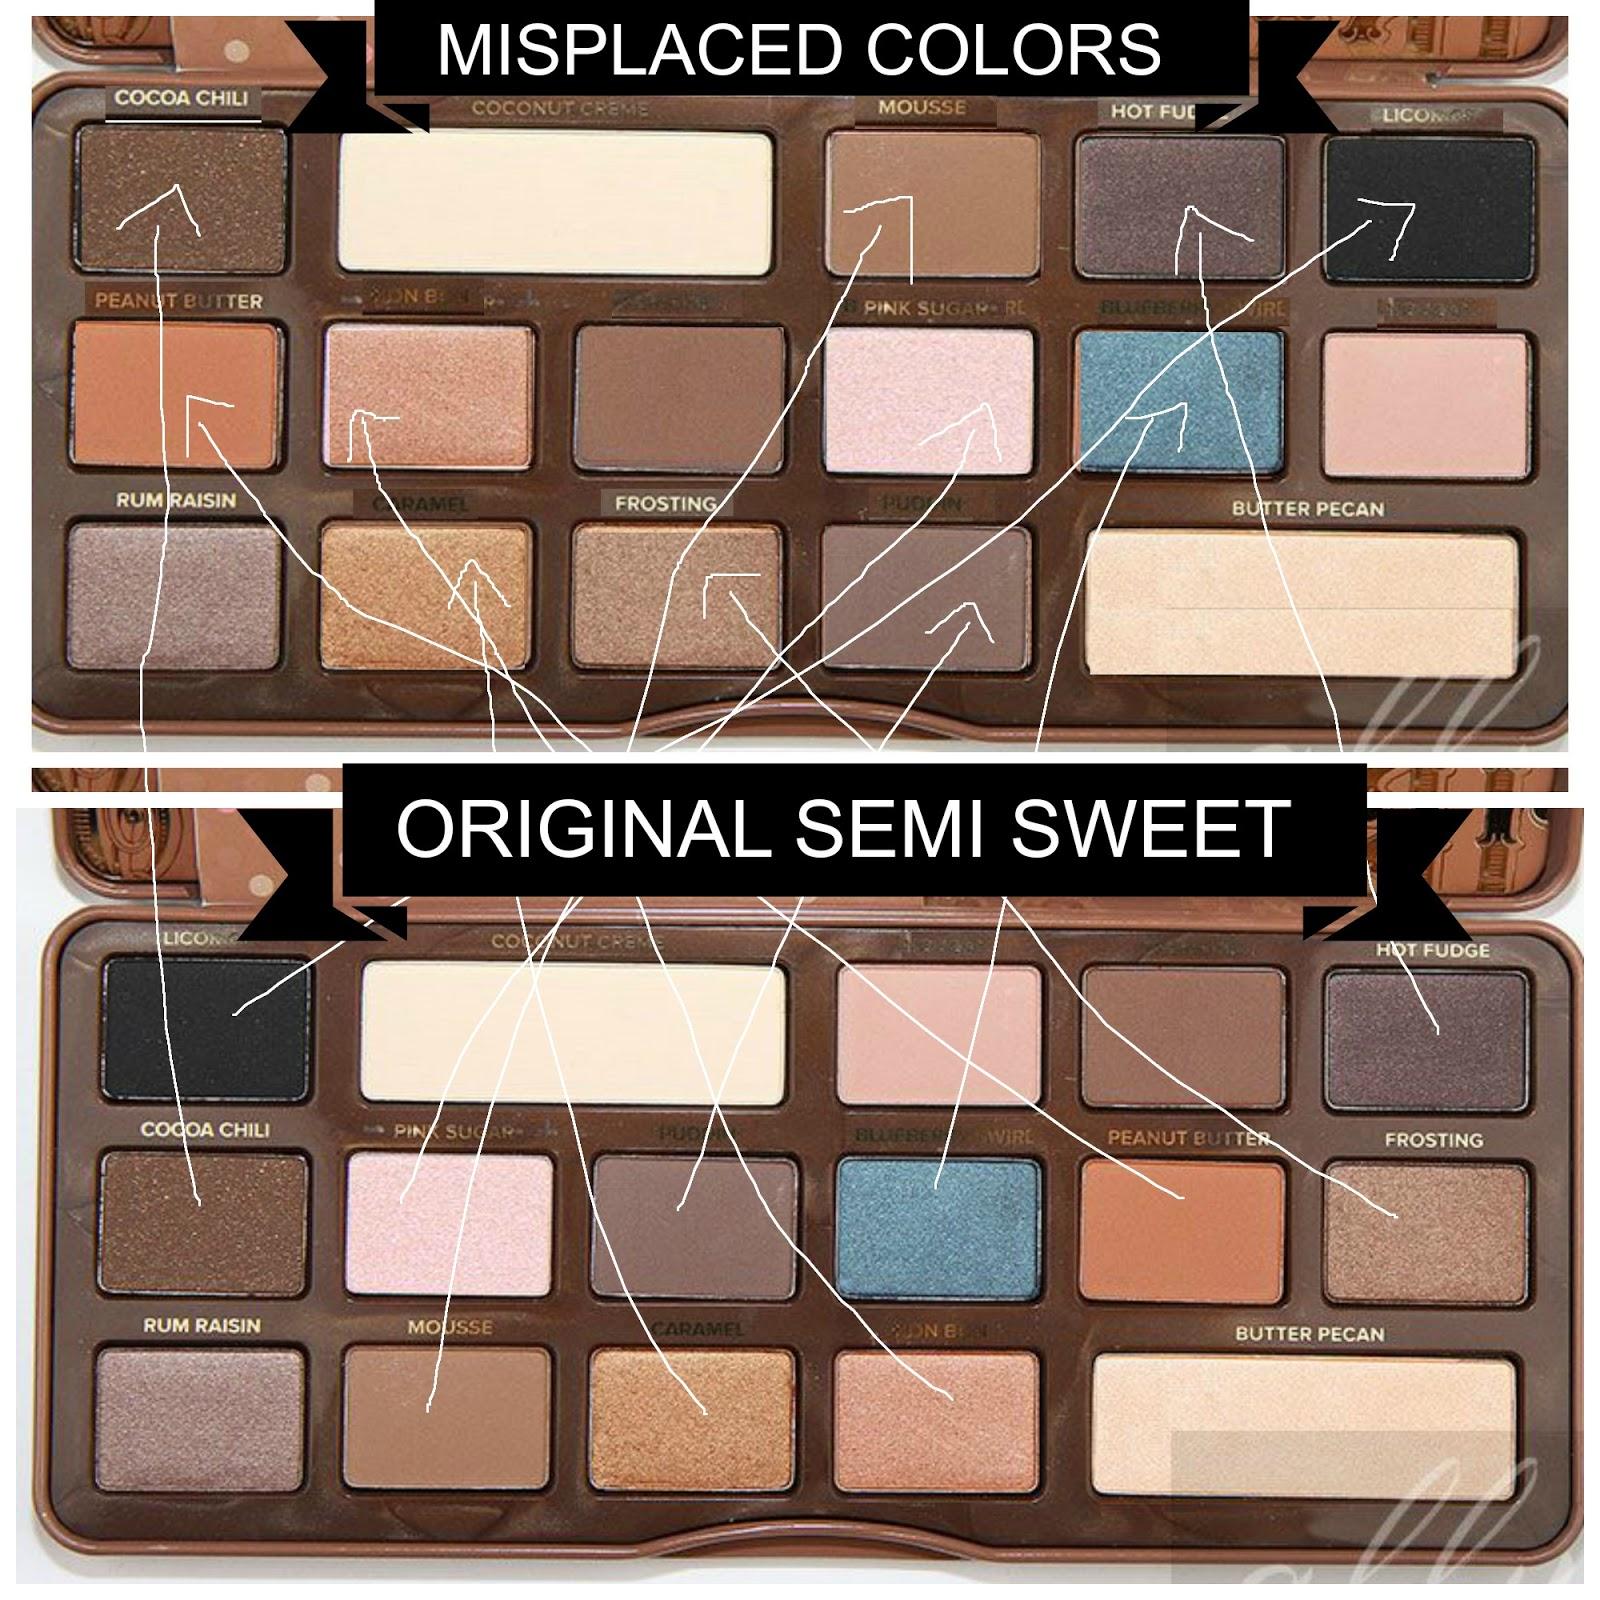 Semi Sweet Chocolate Bar Looks